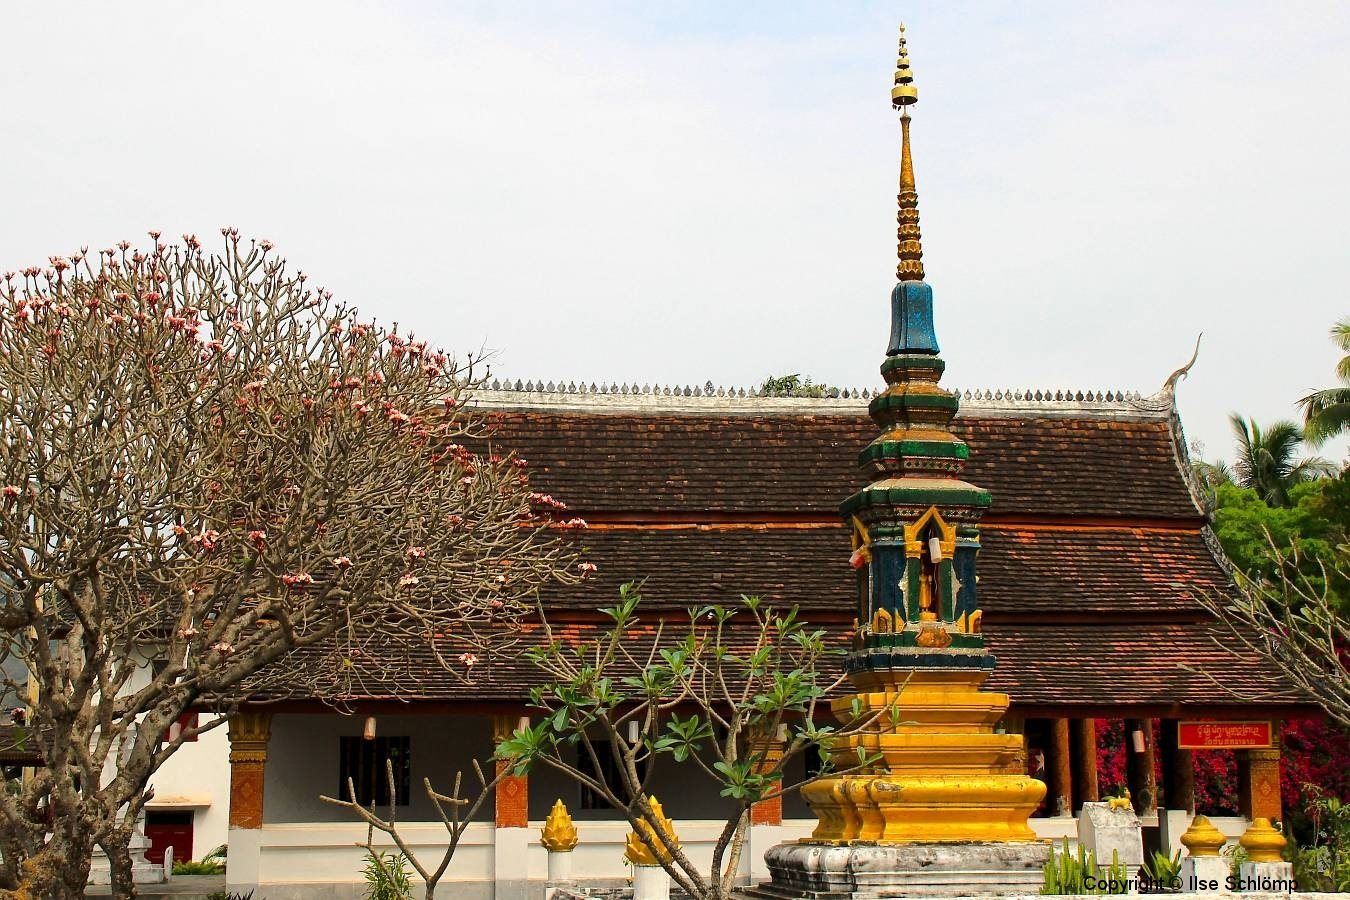 Laos, Luang Prabang, Wat B. Phon Heuang